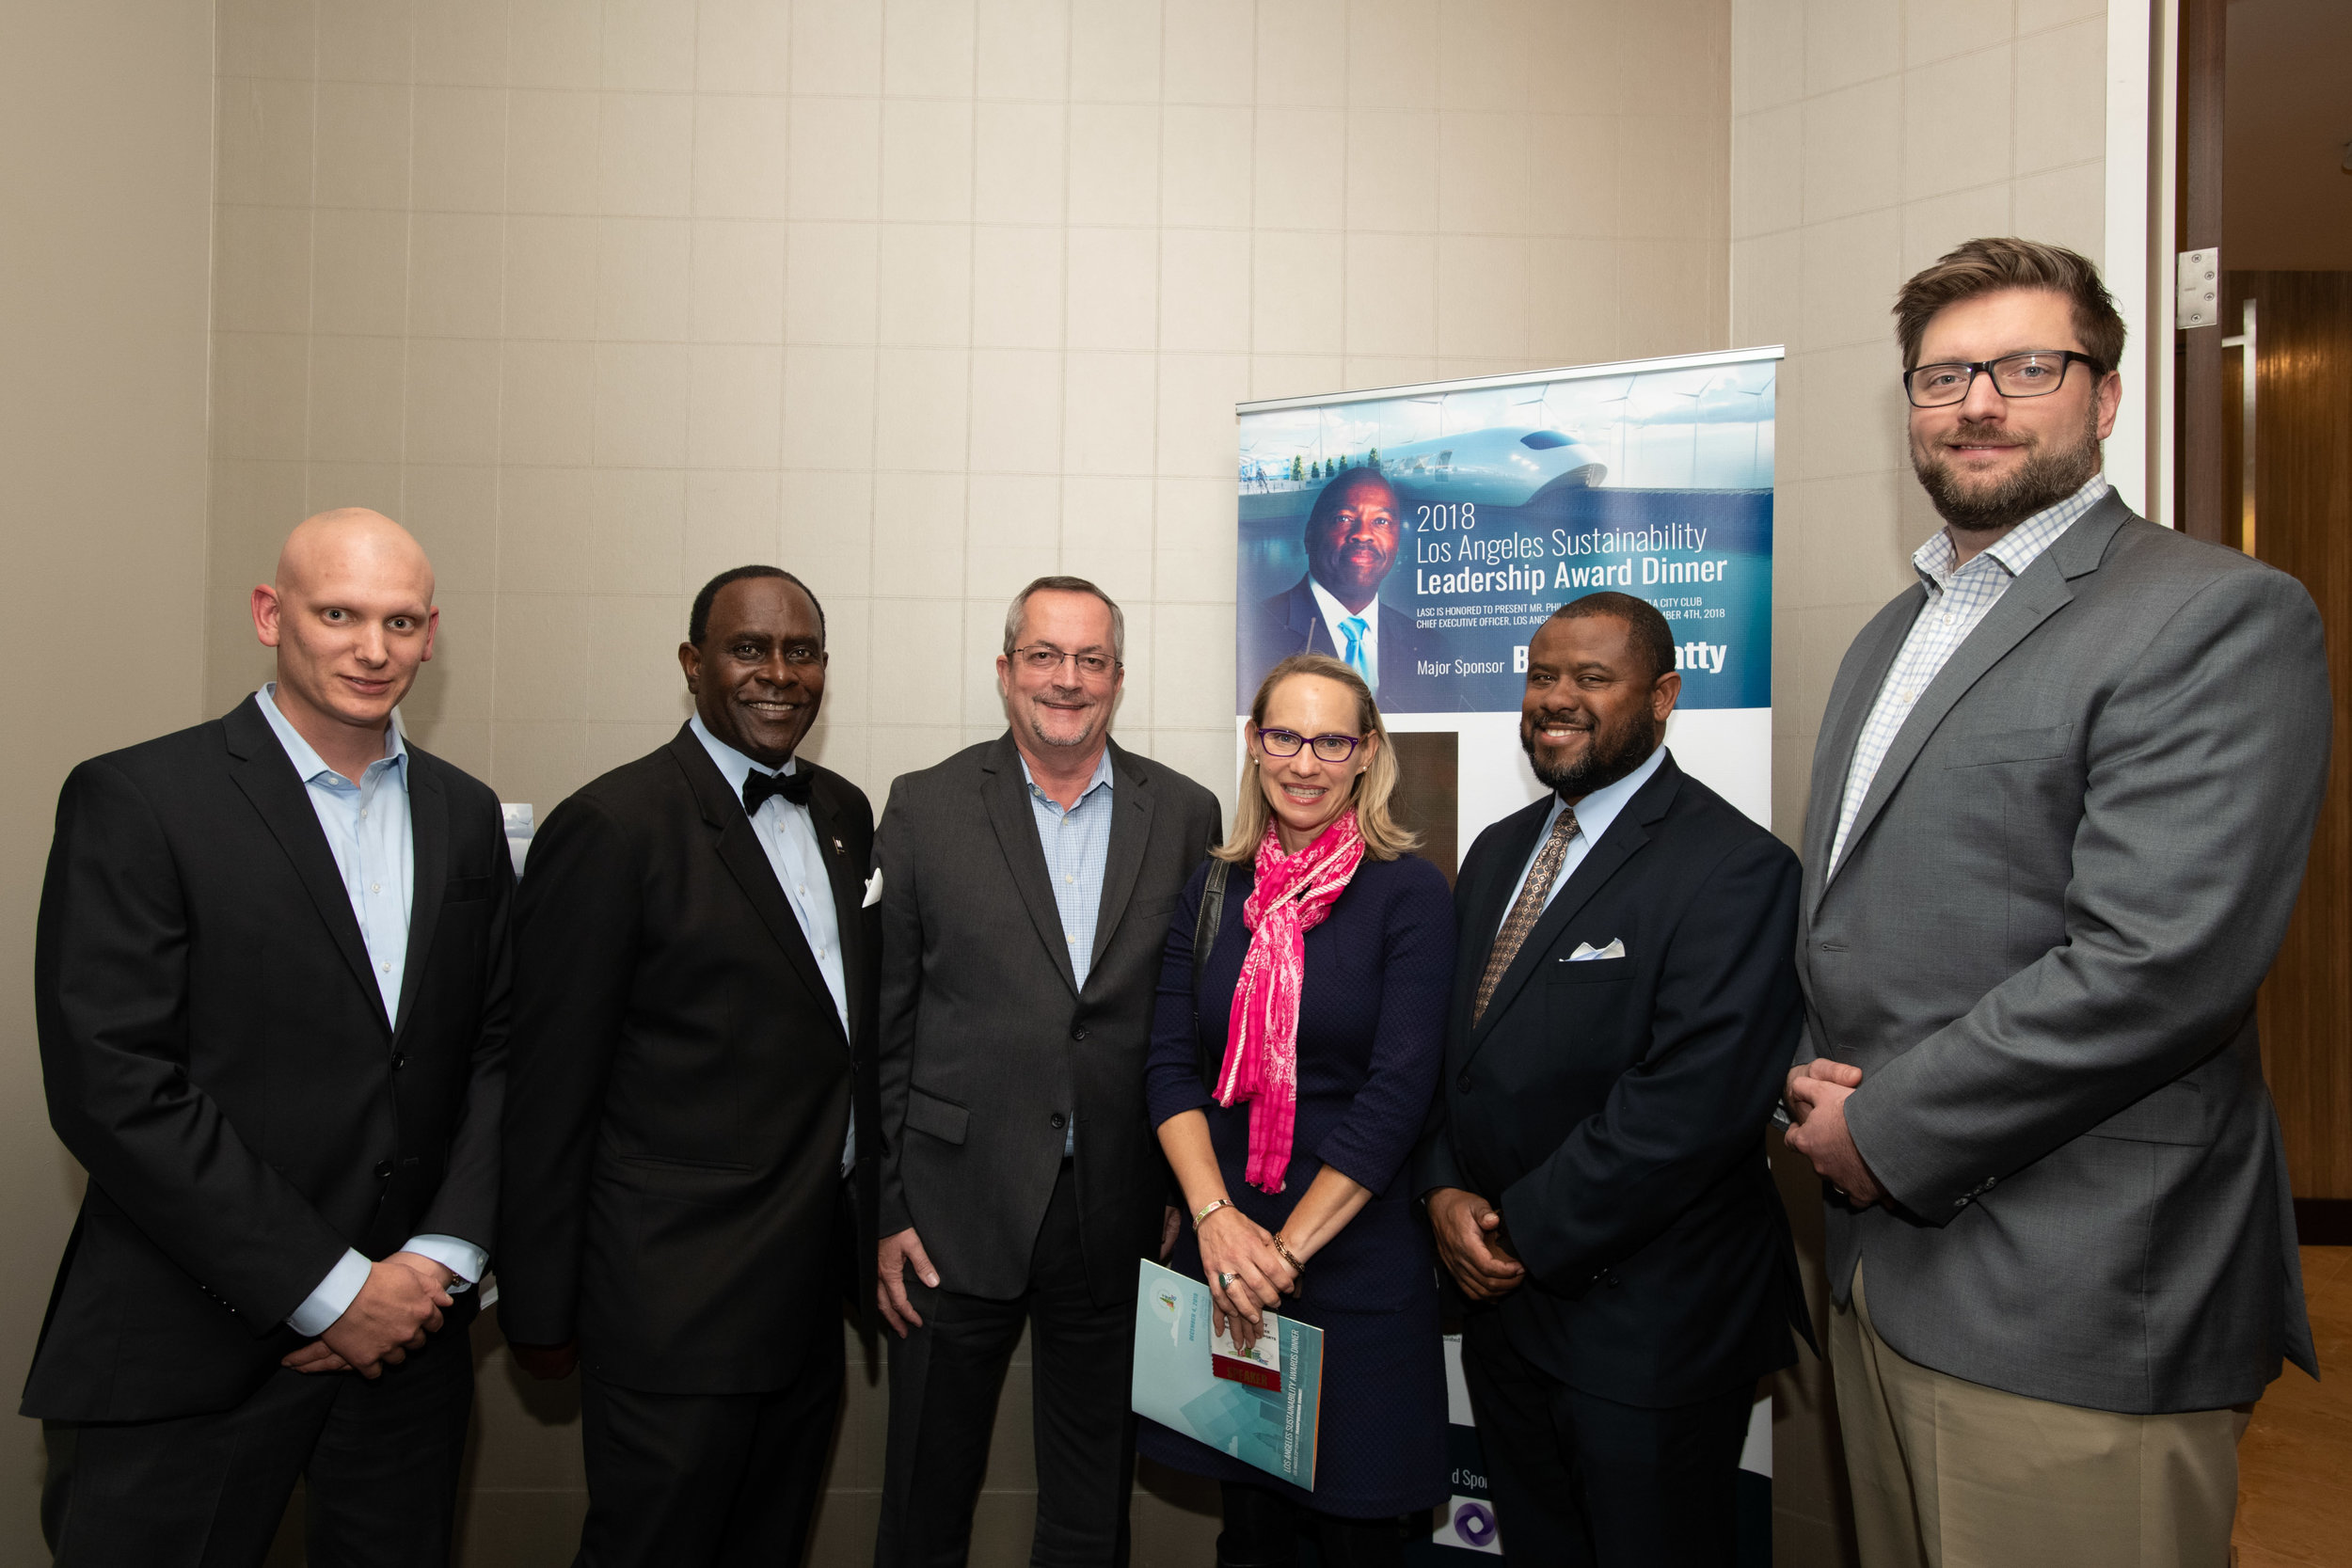 Pic 7 L-R Kelly Phariss, Dr. Sherman Gay, Joe Reed, Tamara McCrossen-Orr, Shannon Lawrence and Mark Jennings